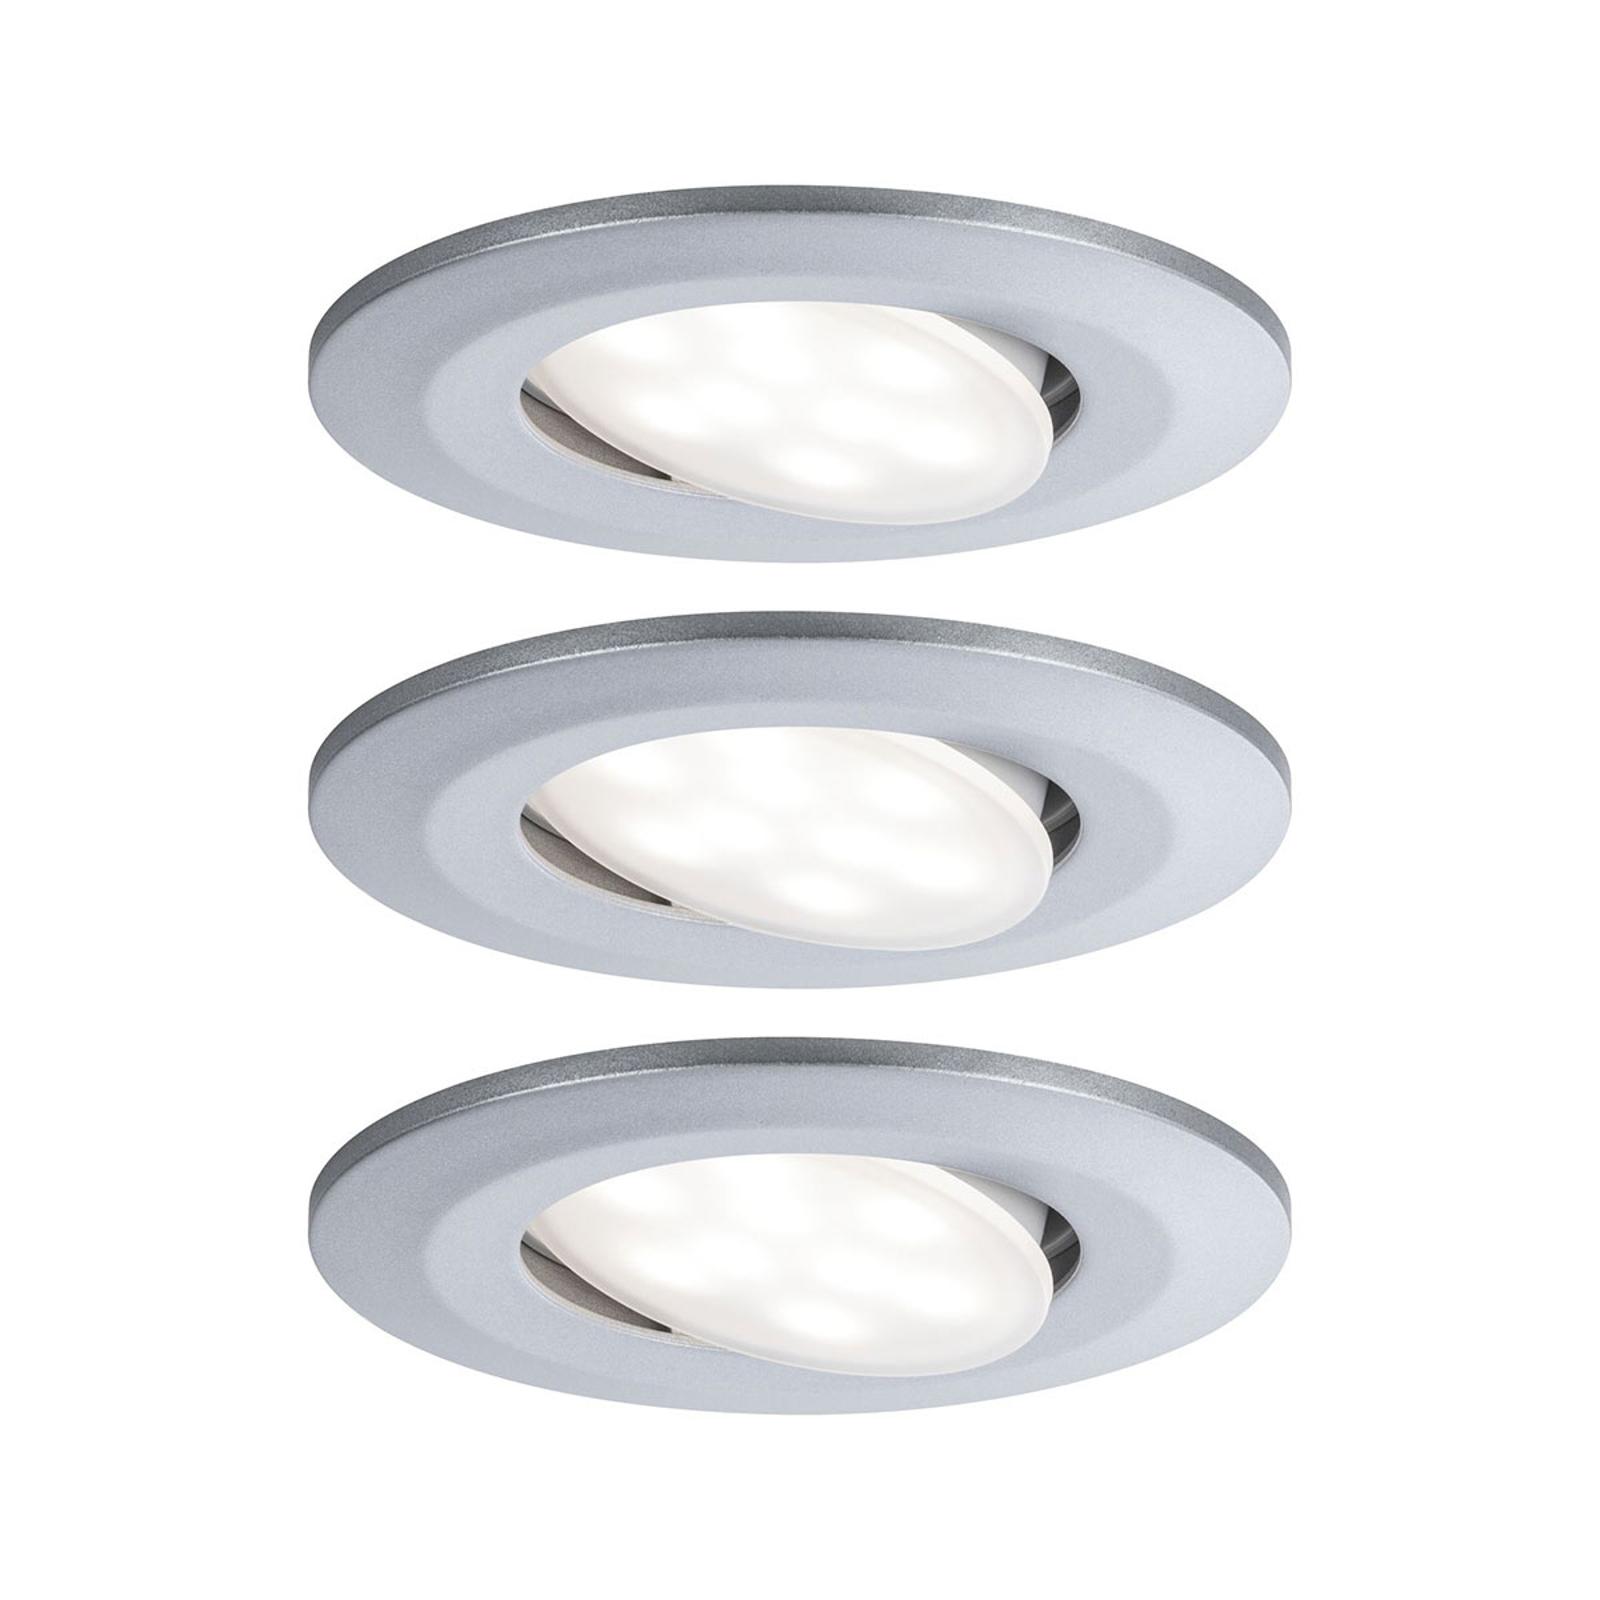 Paulmann LED inbouwspot Calla dimbaar per 3,chroom